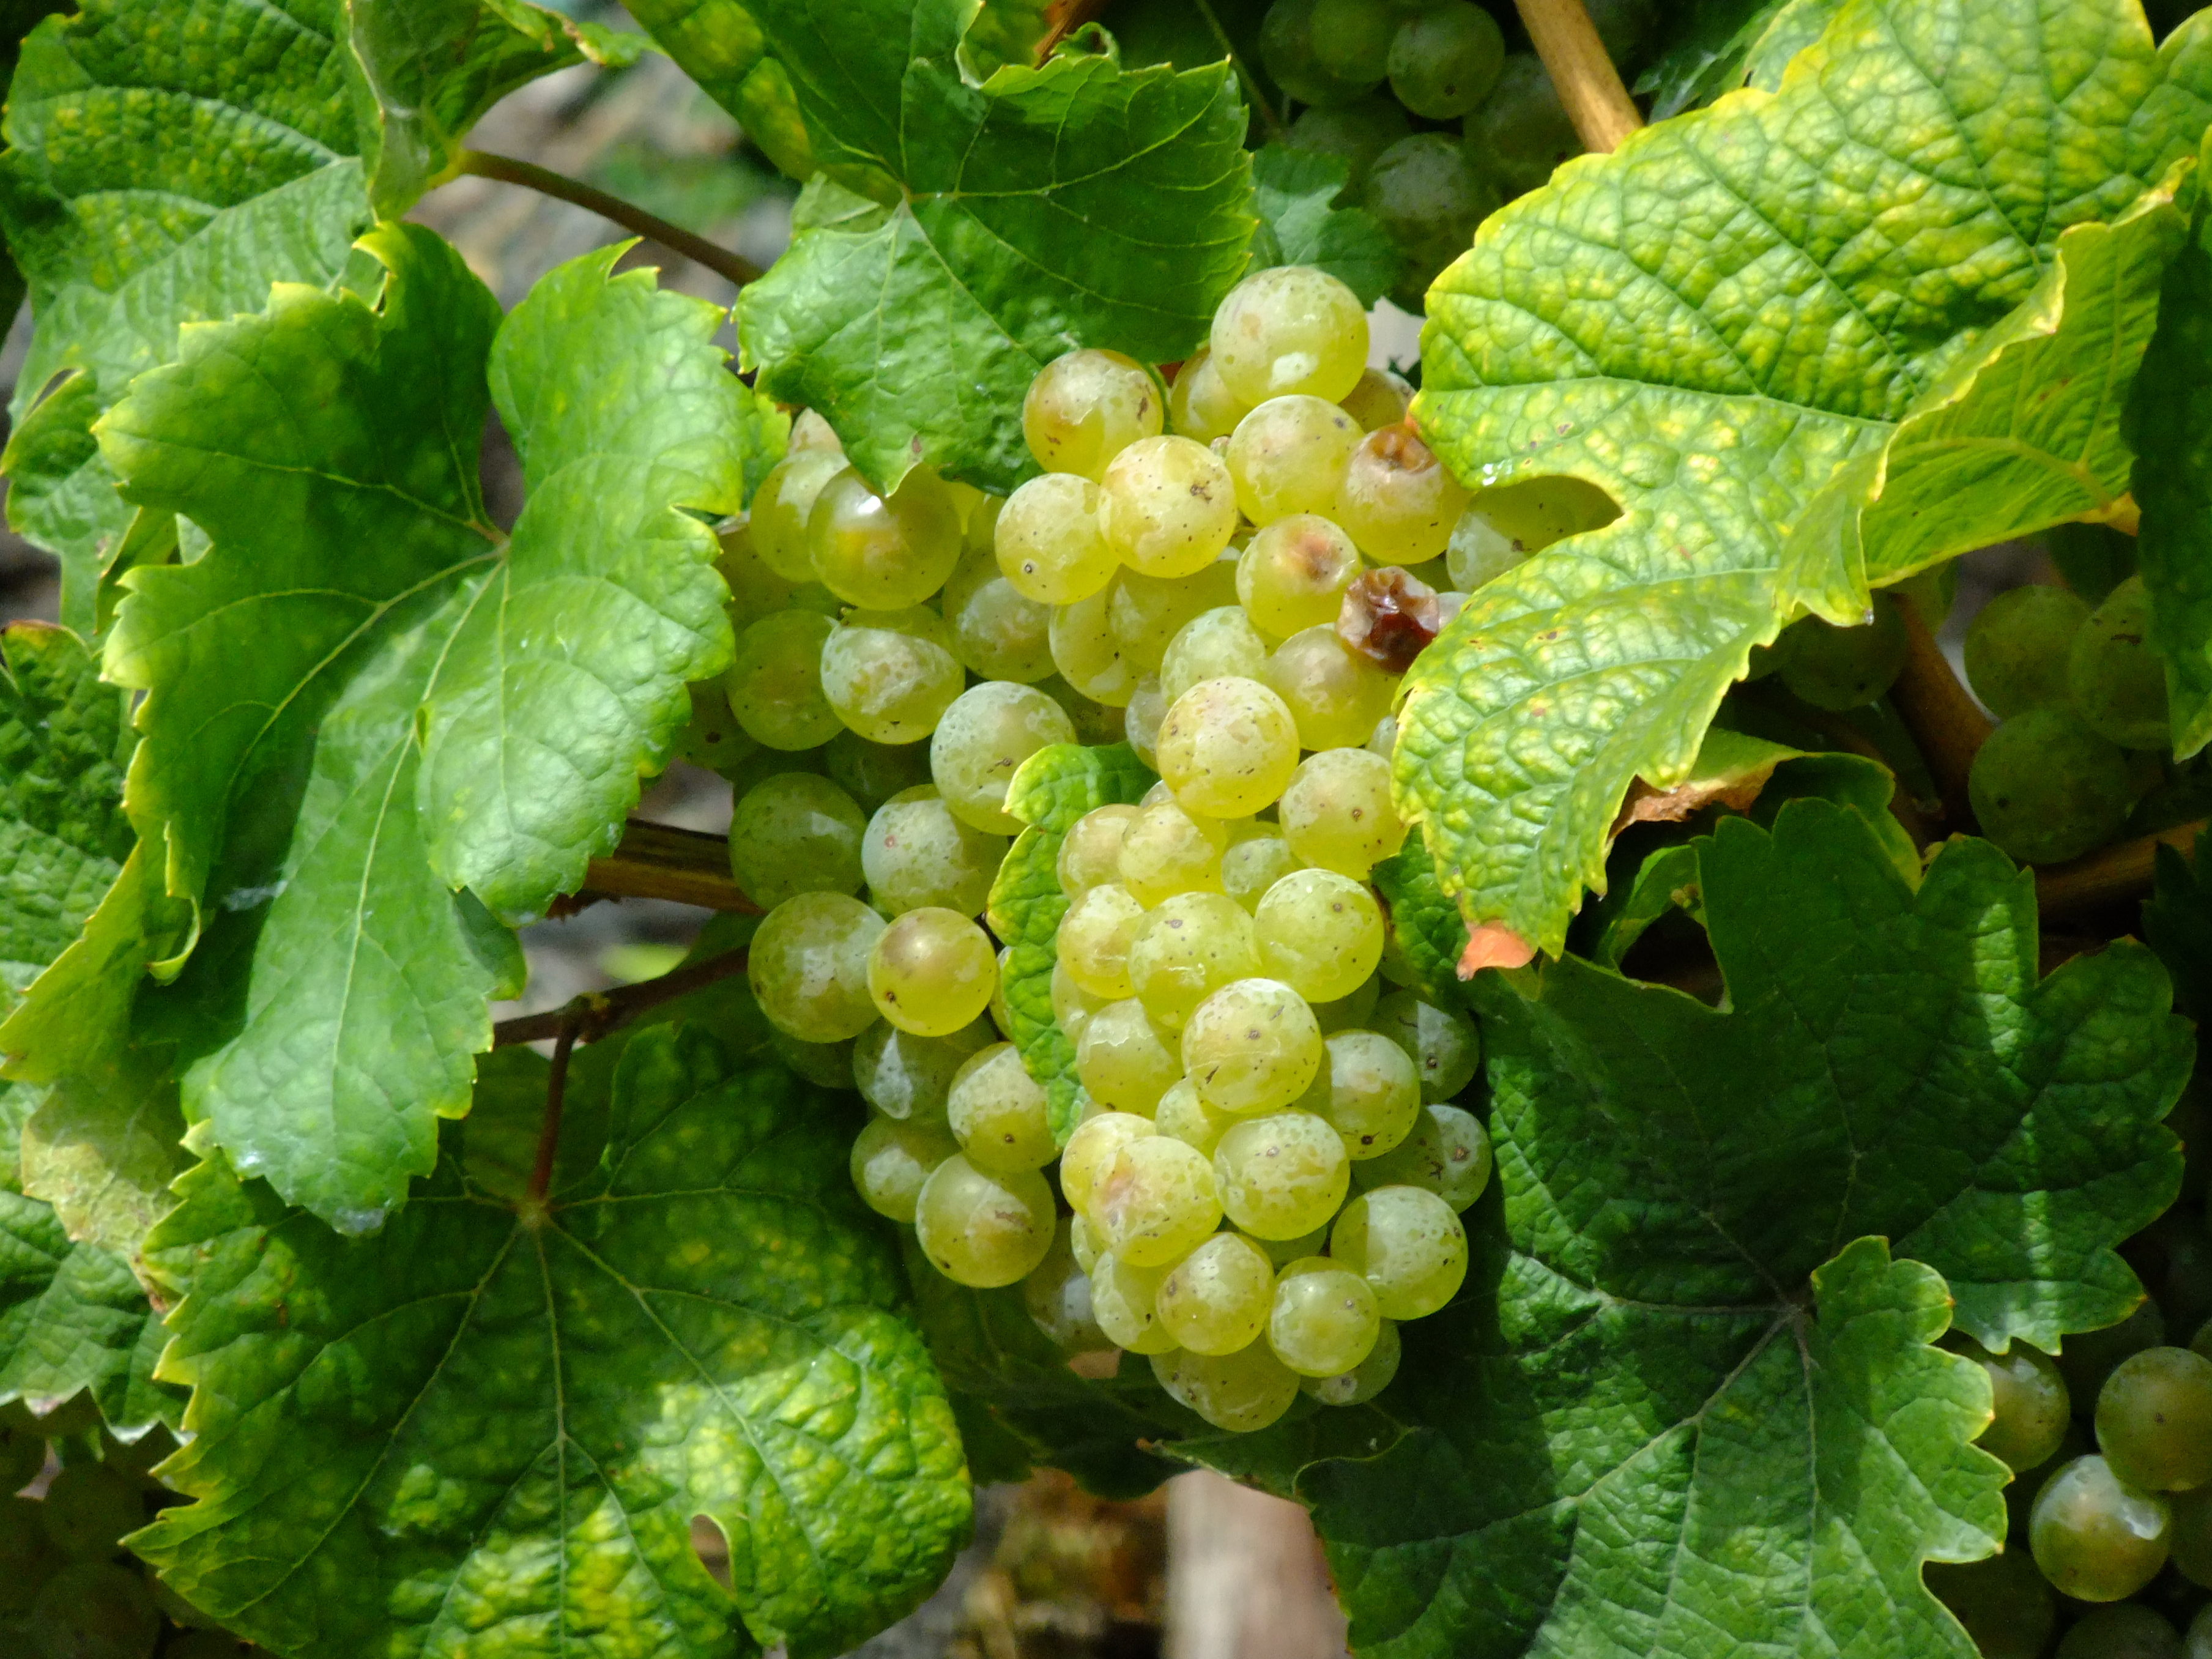 Рислинг: описание белого сорта винограда, характеристики, стилистика вина